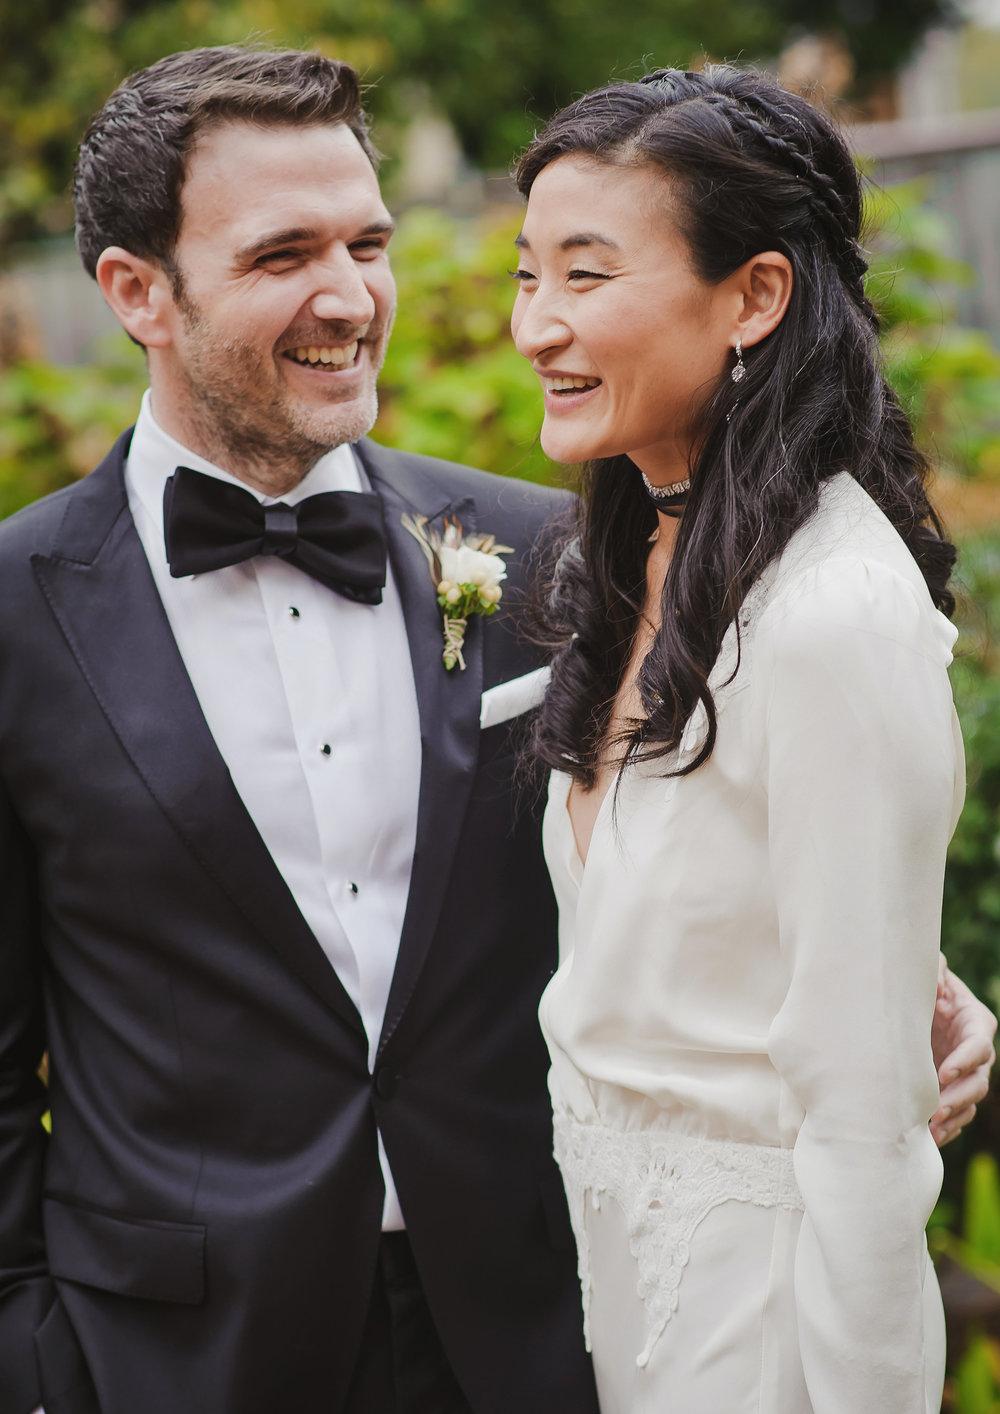 Baltimore Legg Mason Tower Wedding | East Made Event Company Baltimore Maryland Wedding Planner | Photo by Hannah Gunnell2329.jpg